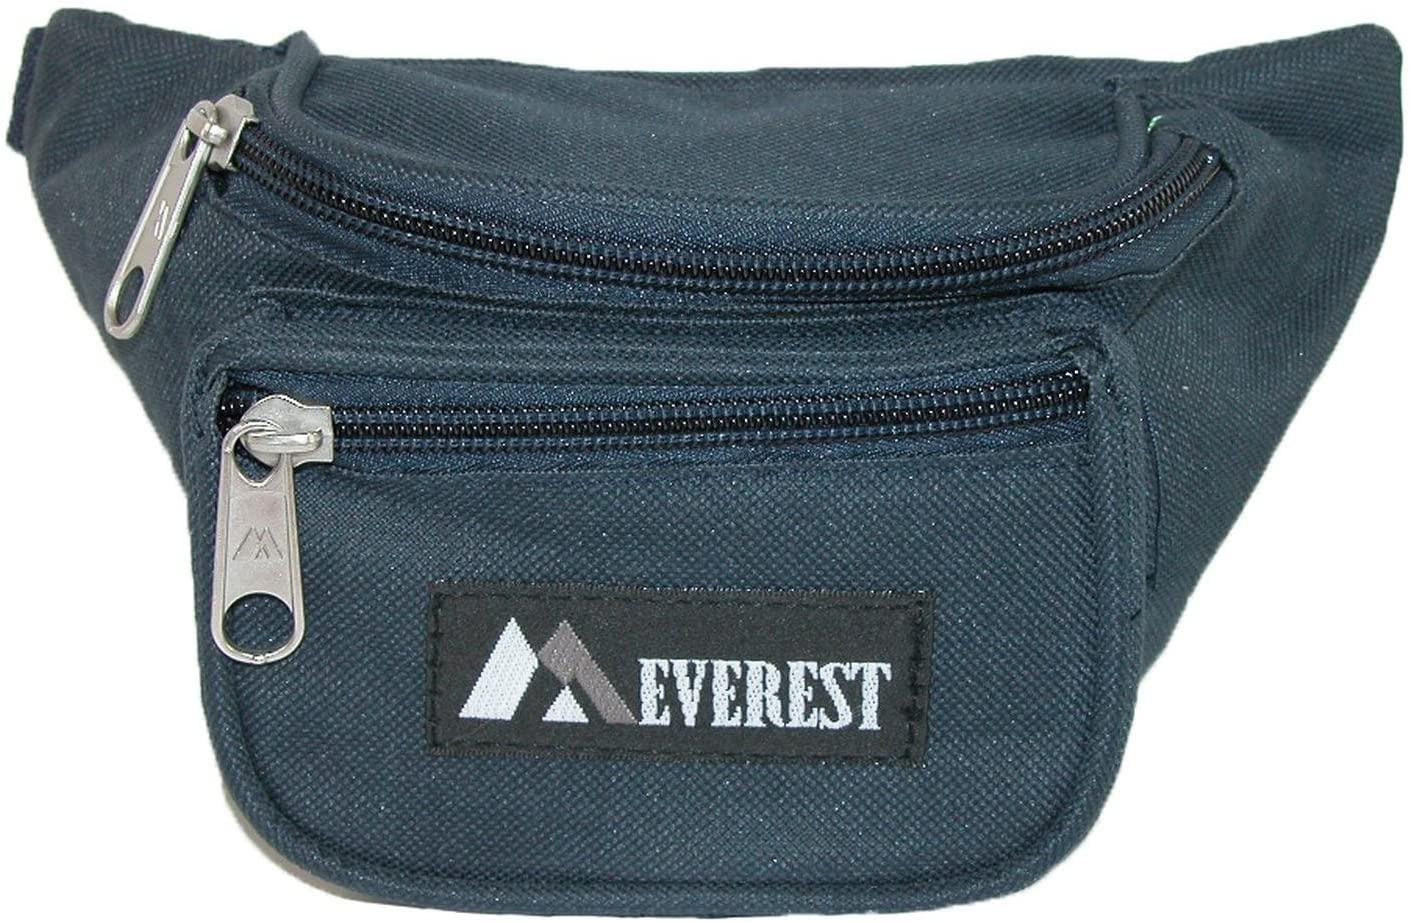 Everest Boys' Fabric Waist Pack, Navy